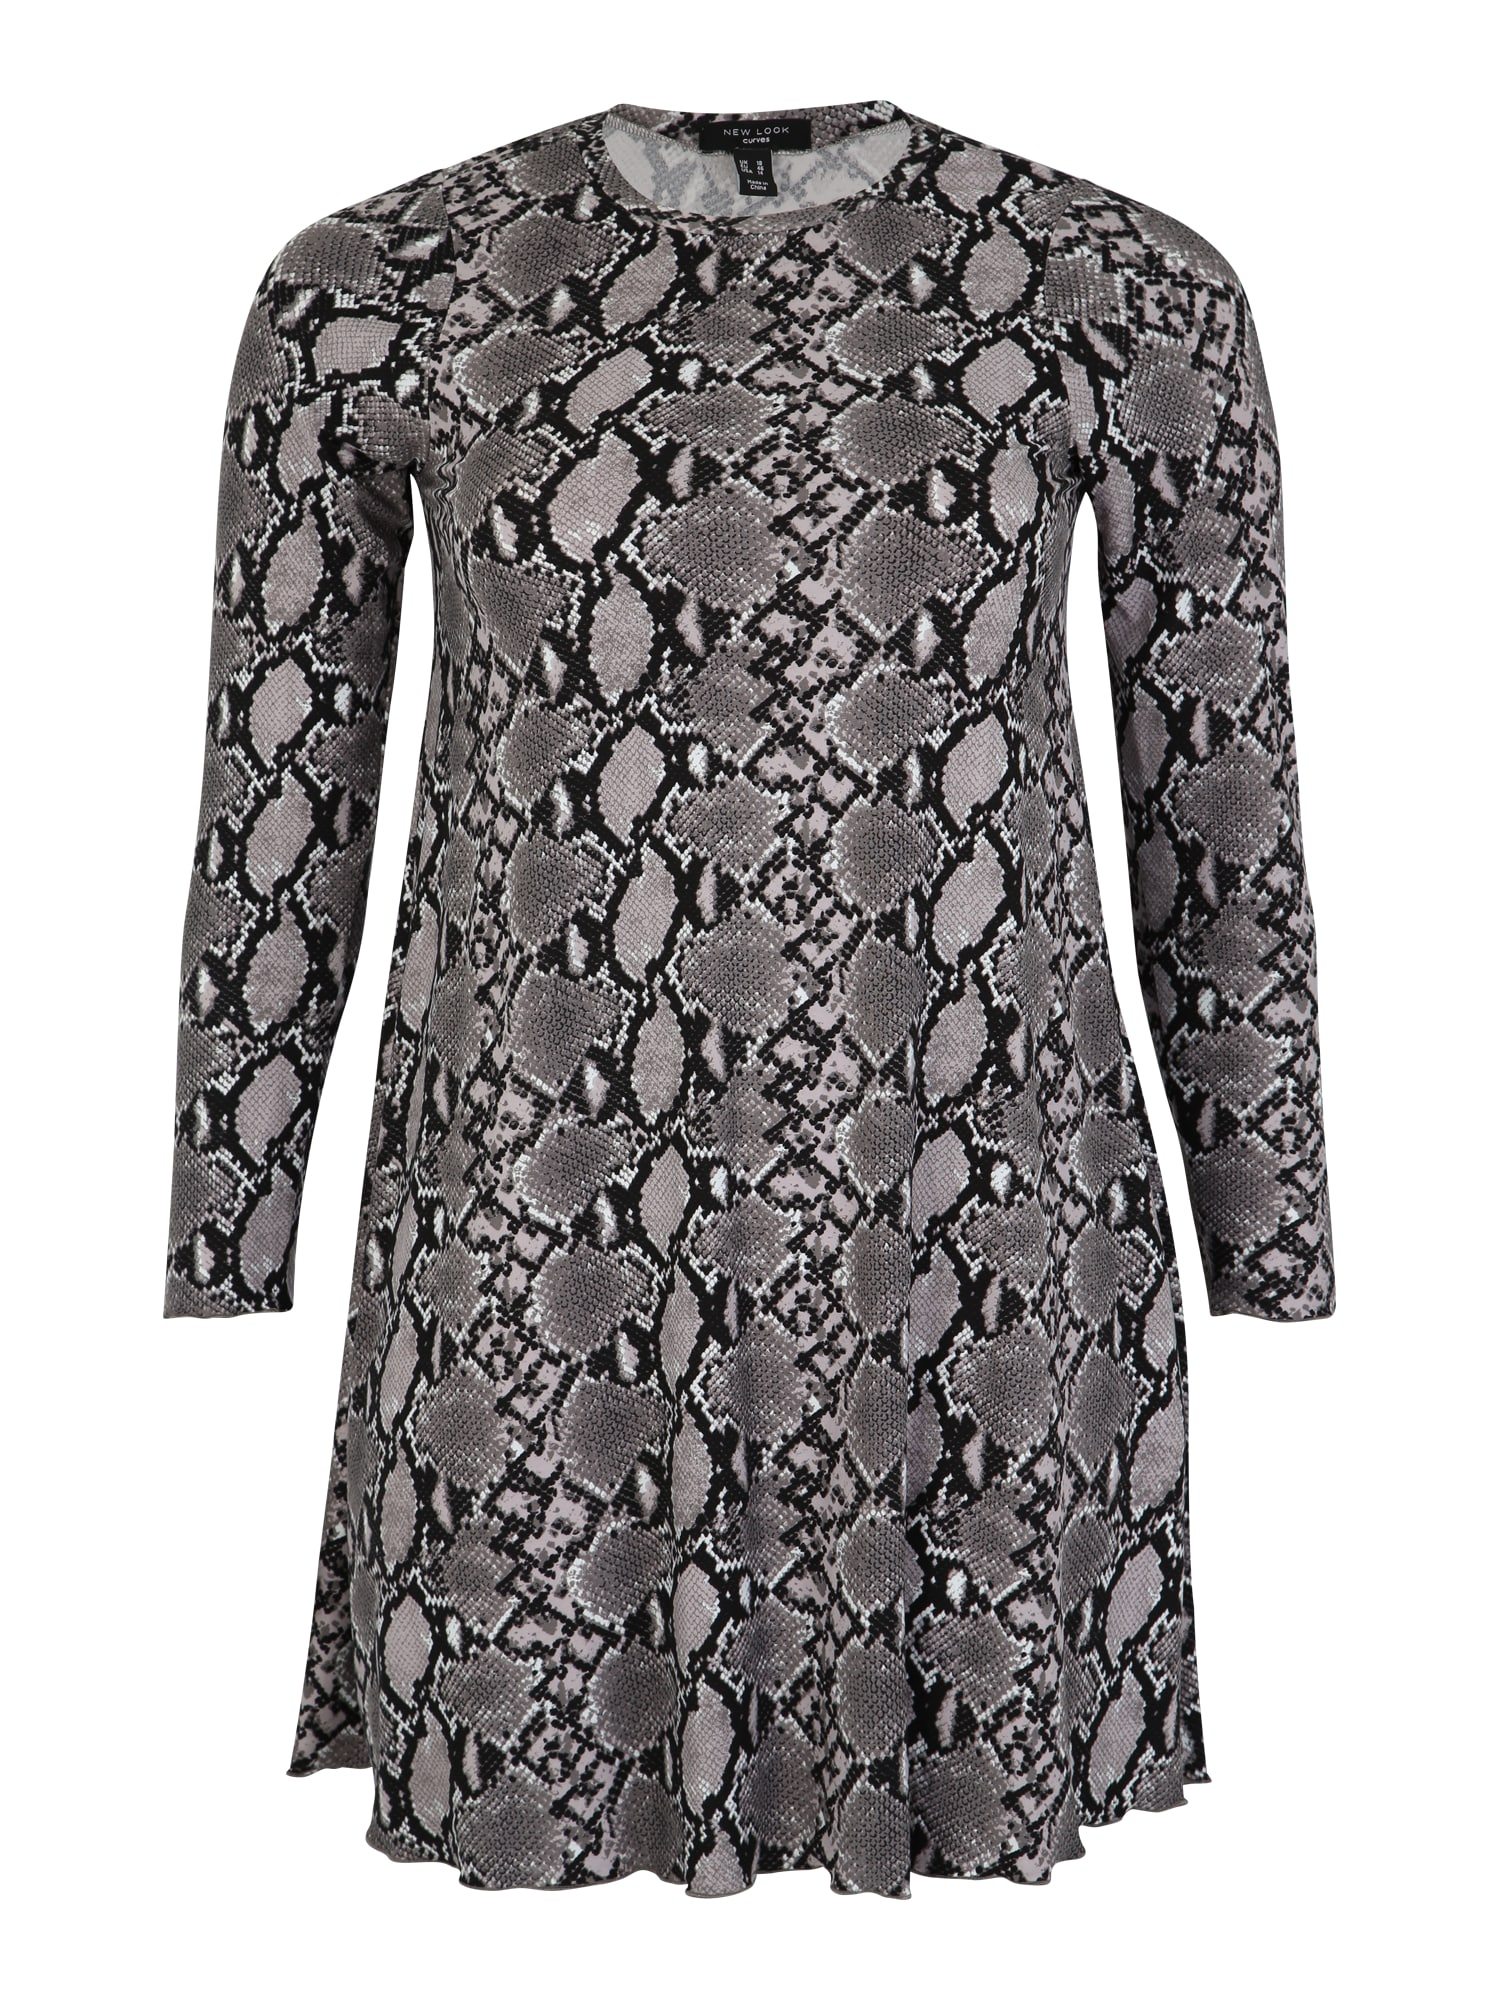 Šaty SNAKE SOFT TOUCH šedá černá bílá New Look Curves